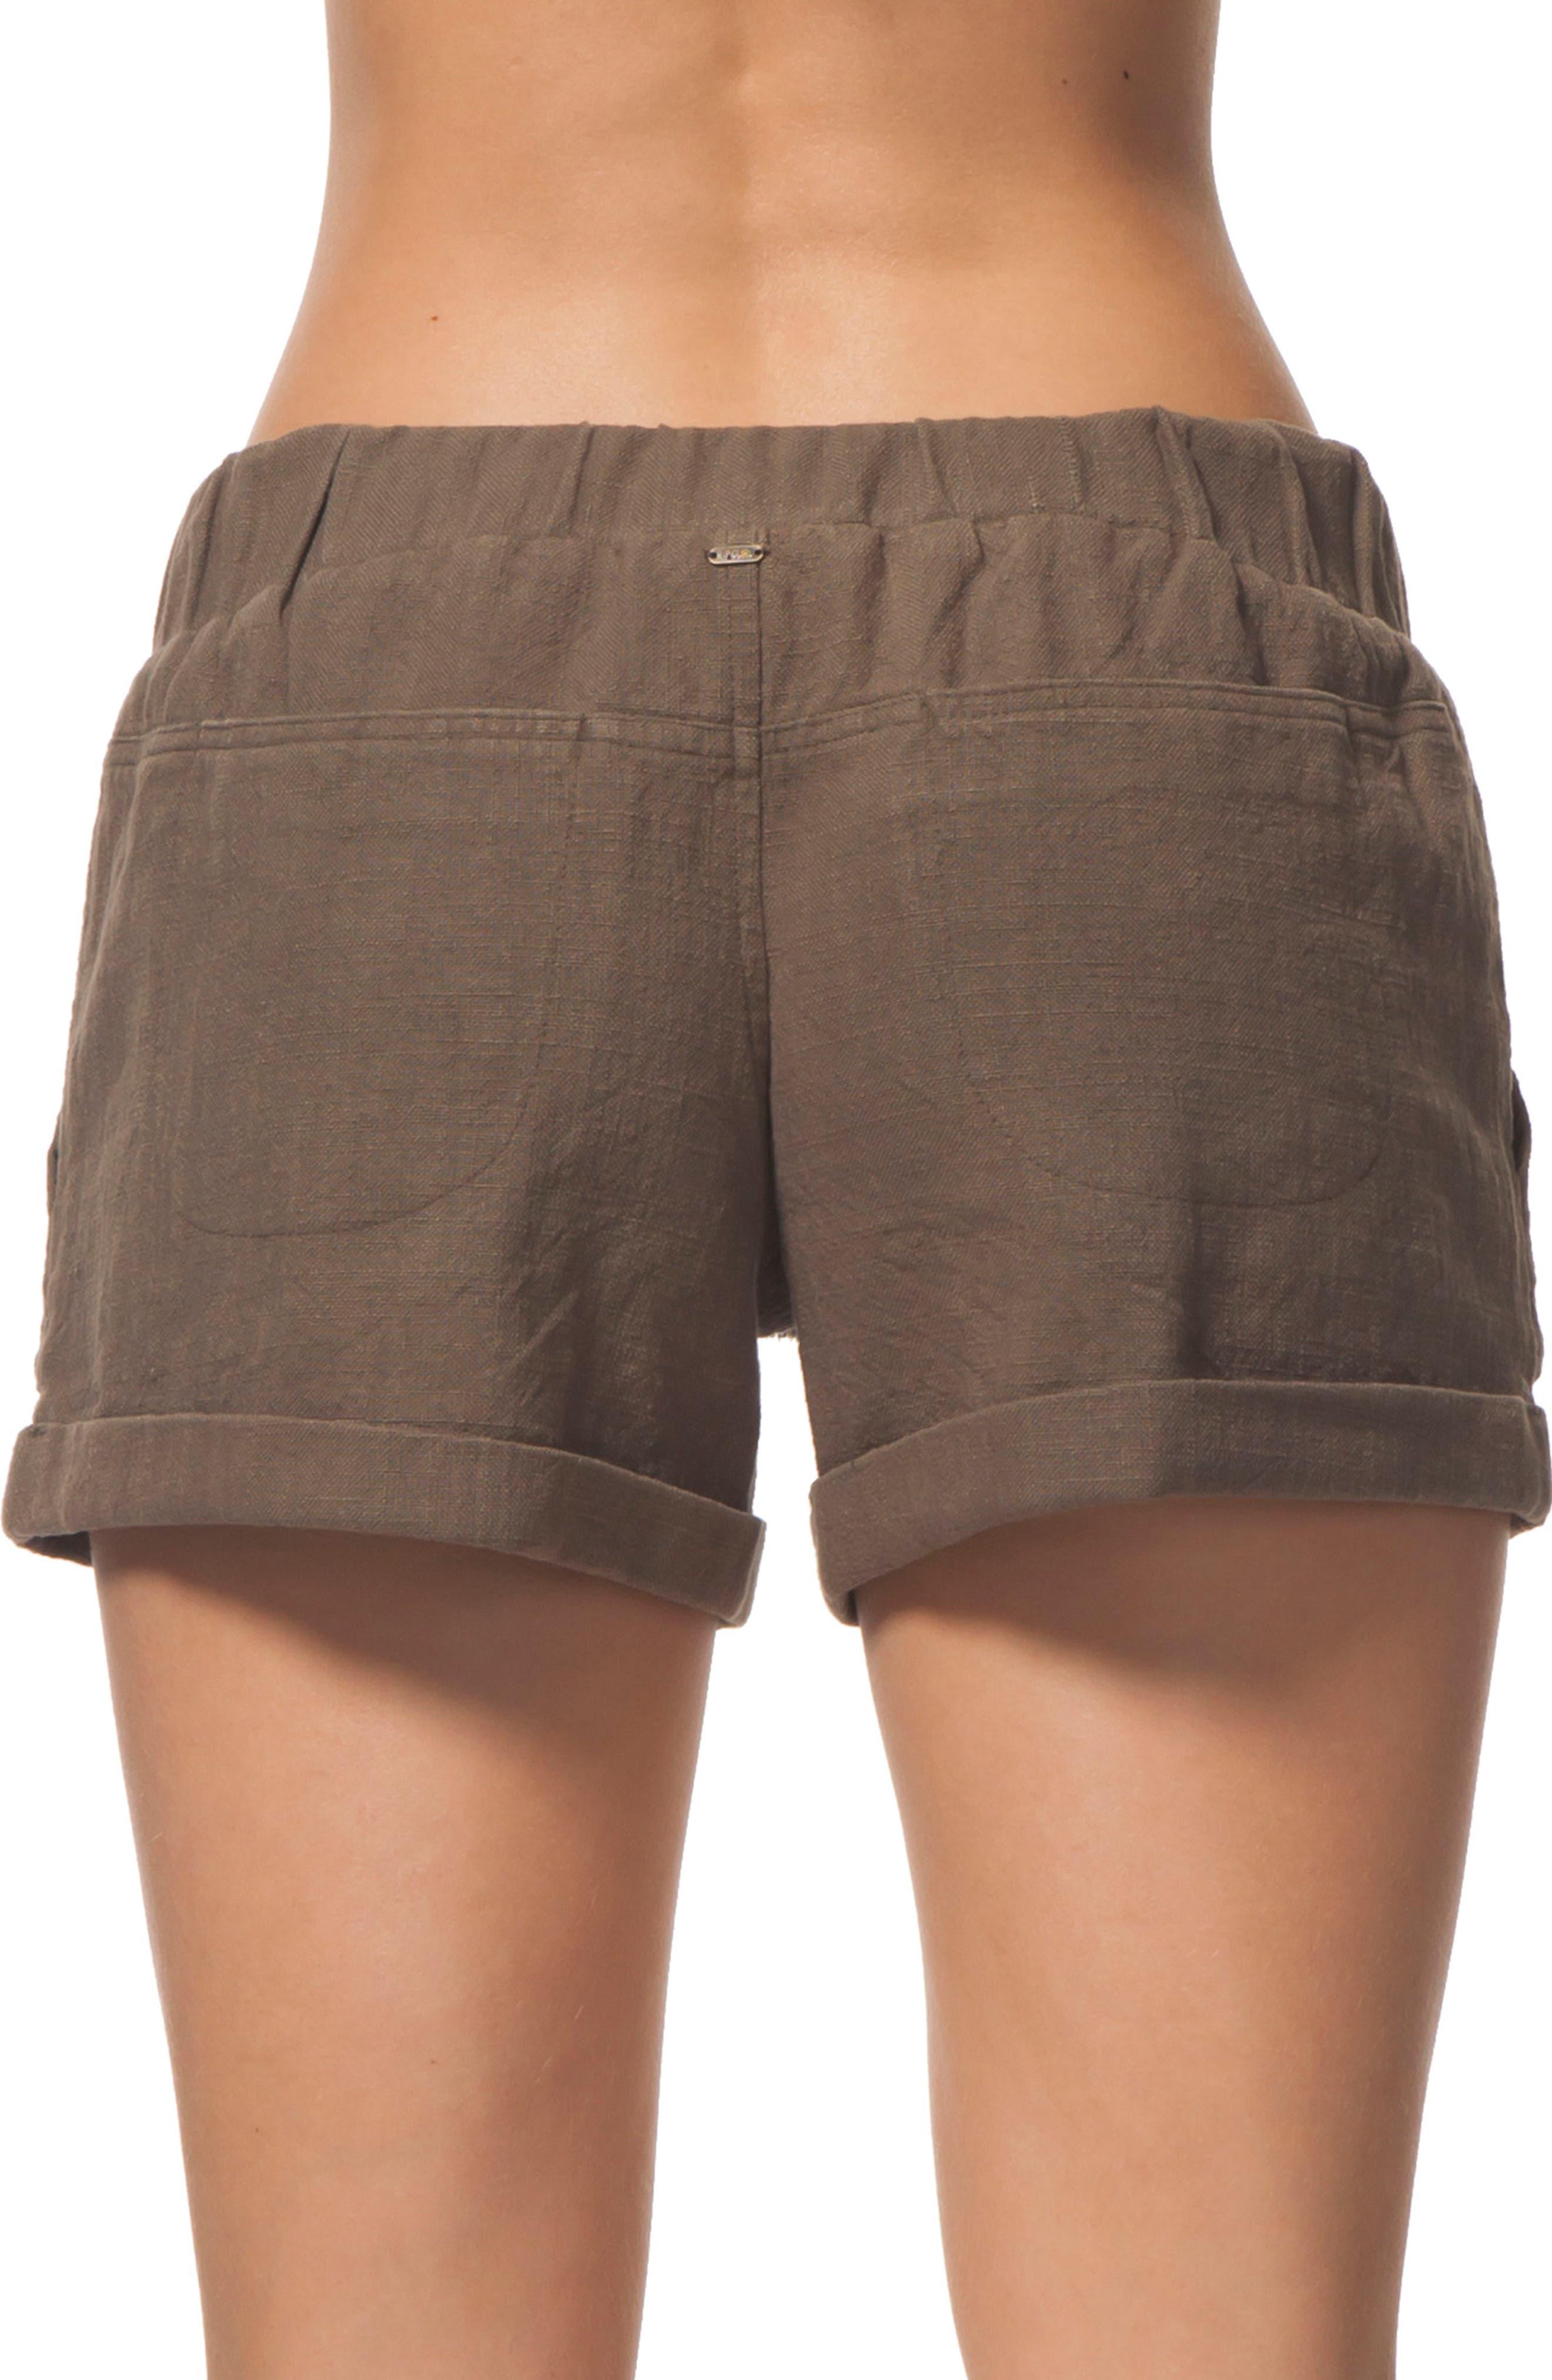 Tumbleweed Cotton Shorts,                             Alternate thumbnail 3, color,                             Army